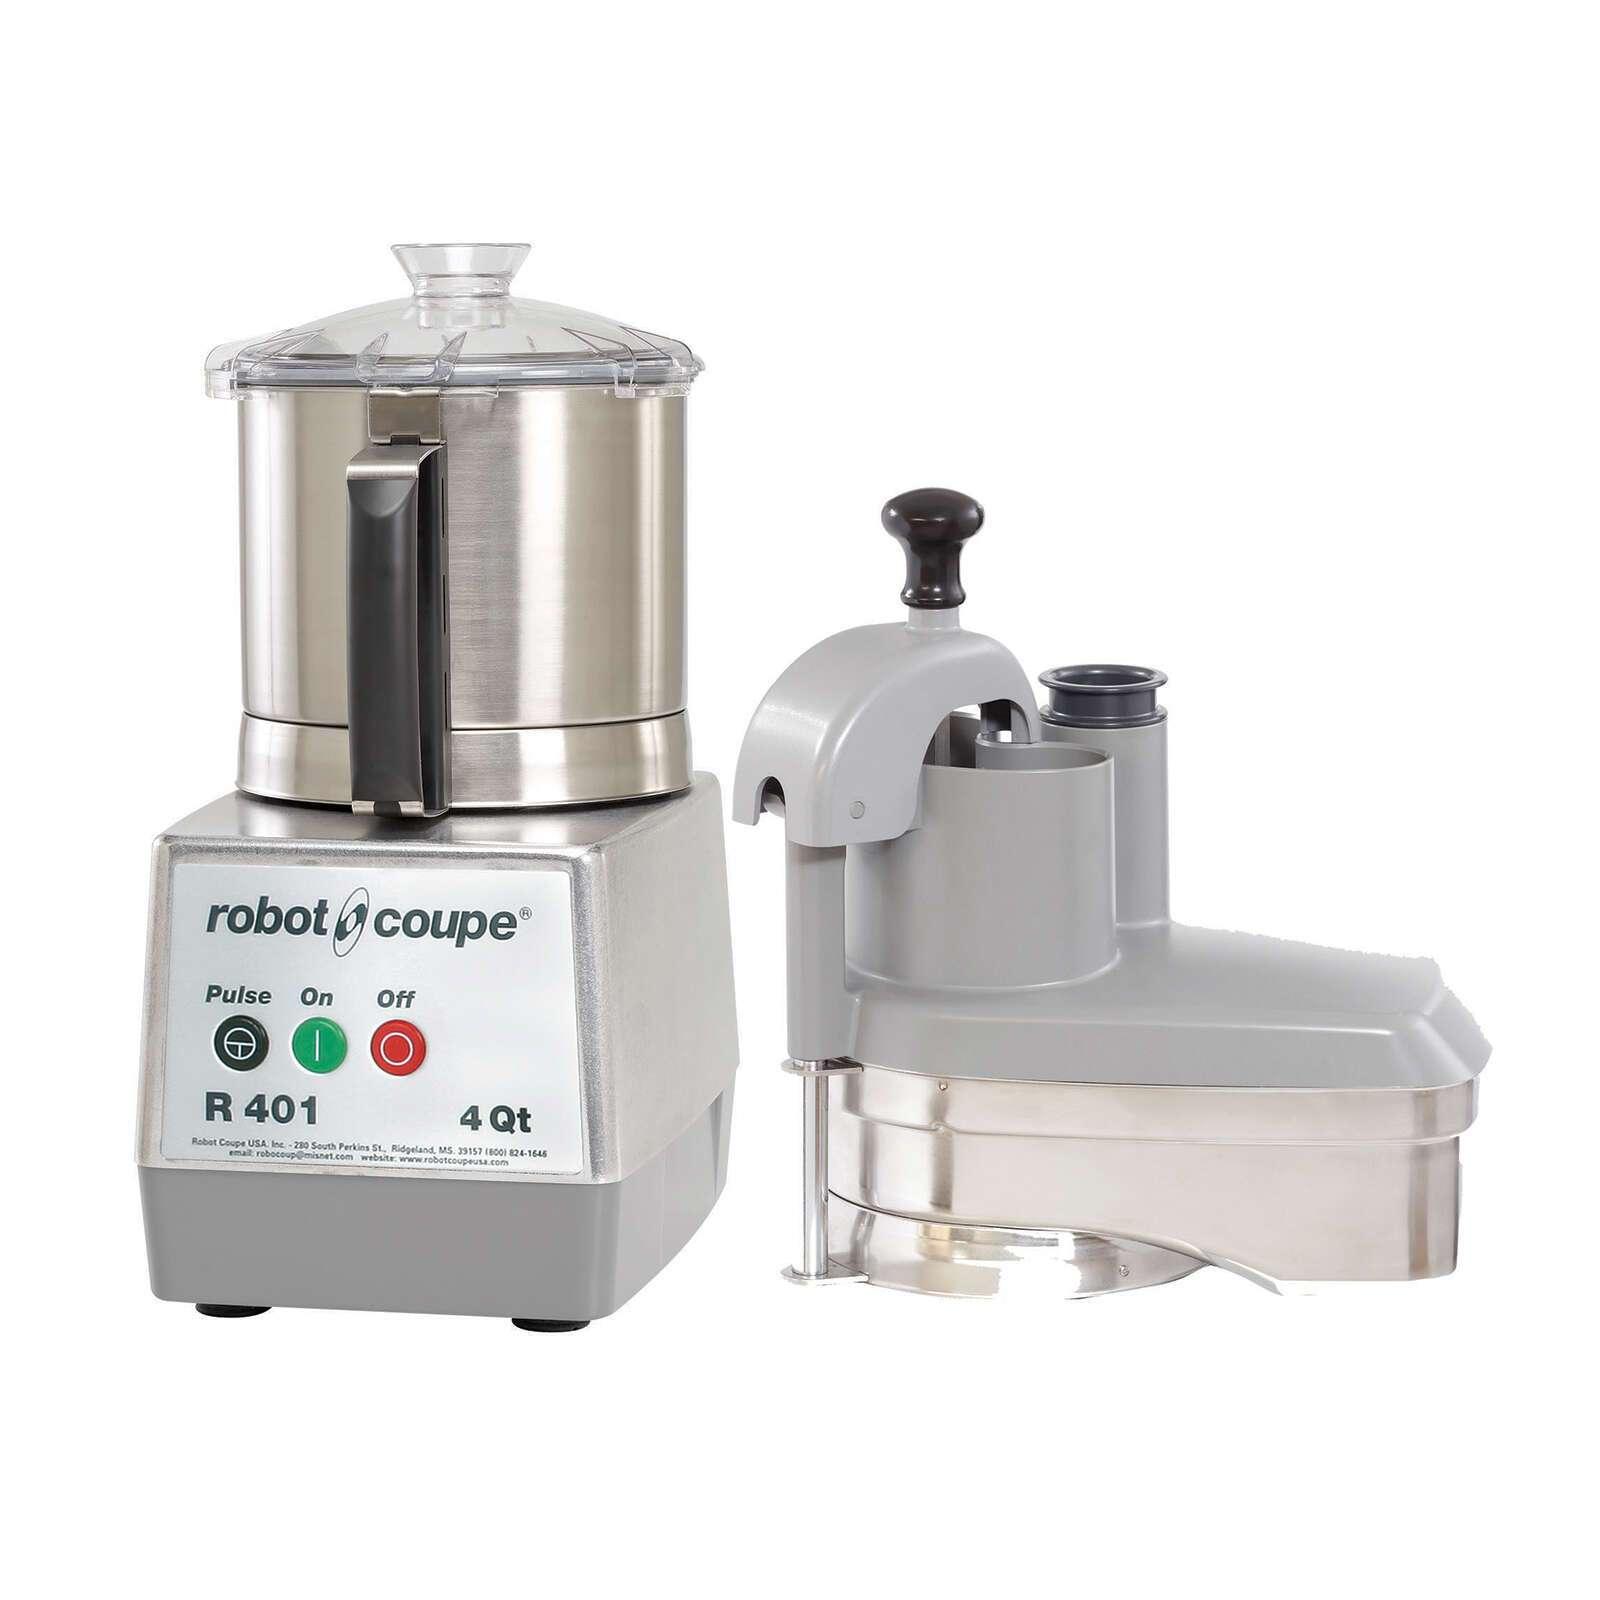 Robot coupe r401 combination food processor - Robot soupe chauffant ...